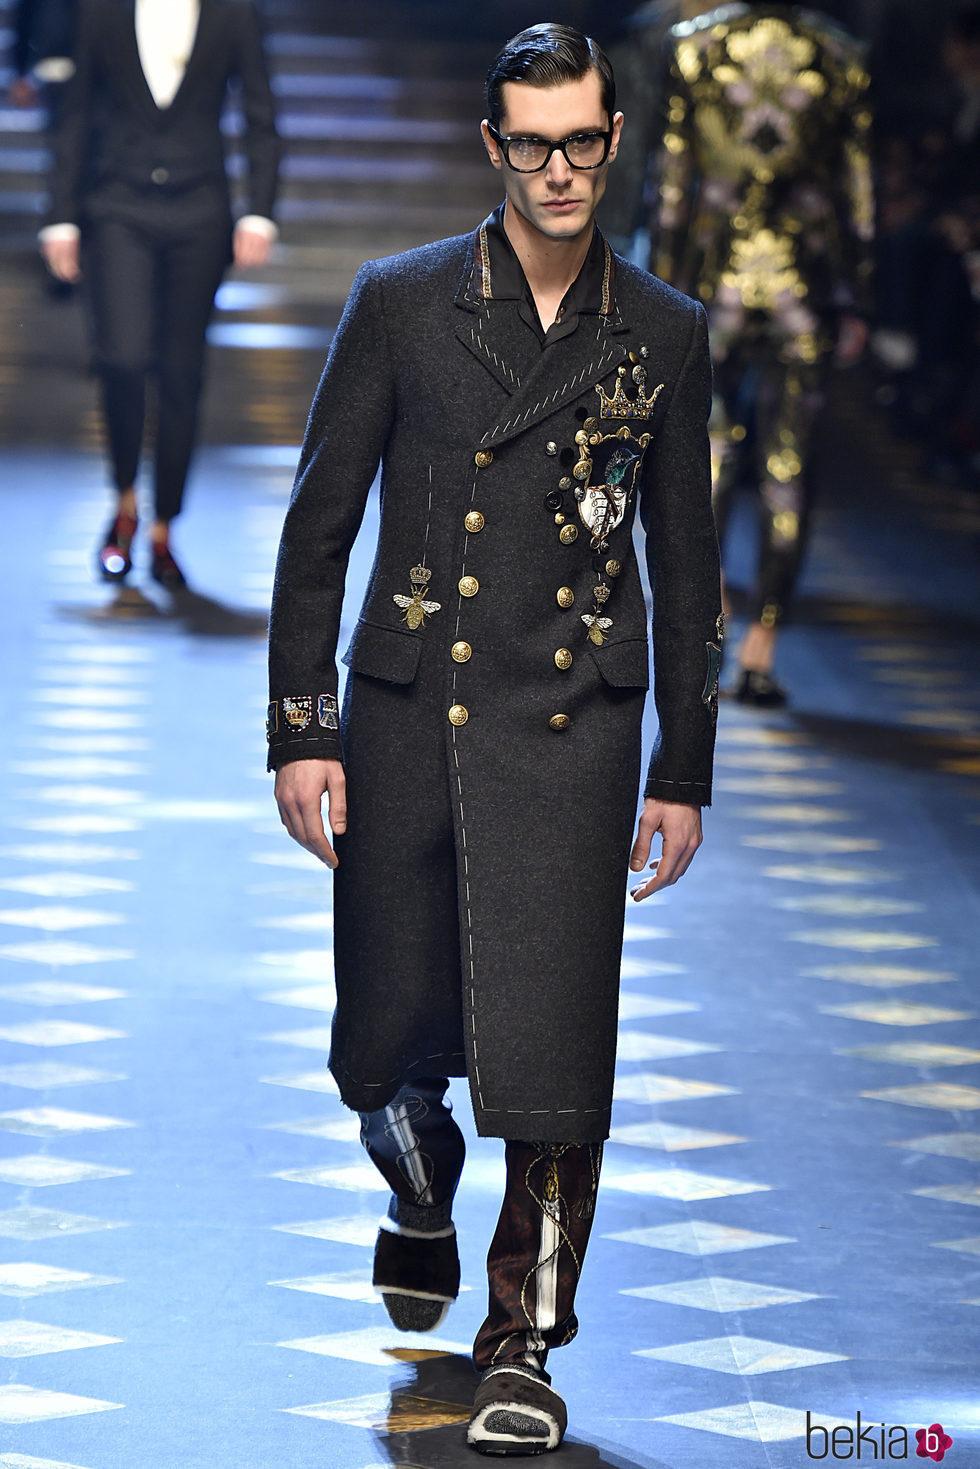 Abrigo de estilo militar de Dolce & Gabbana otoño/invierno ...